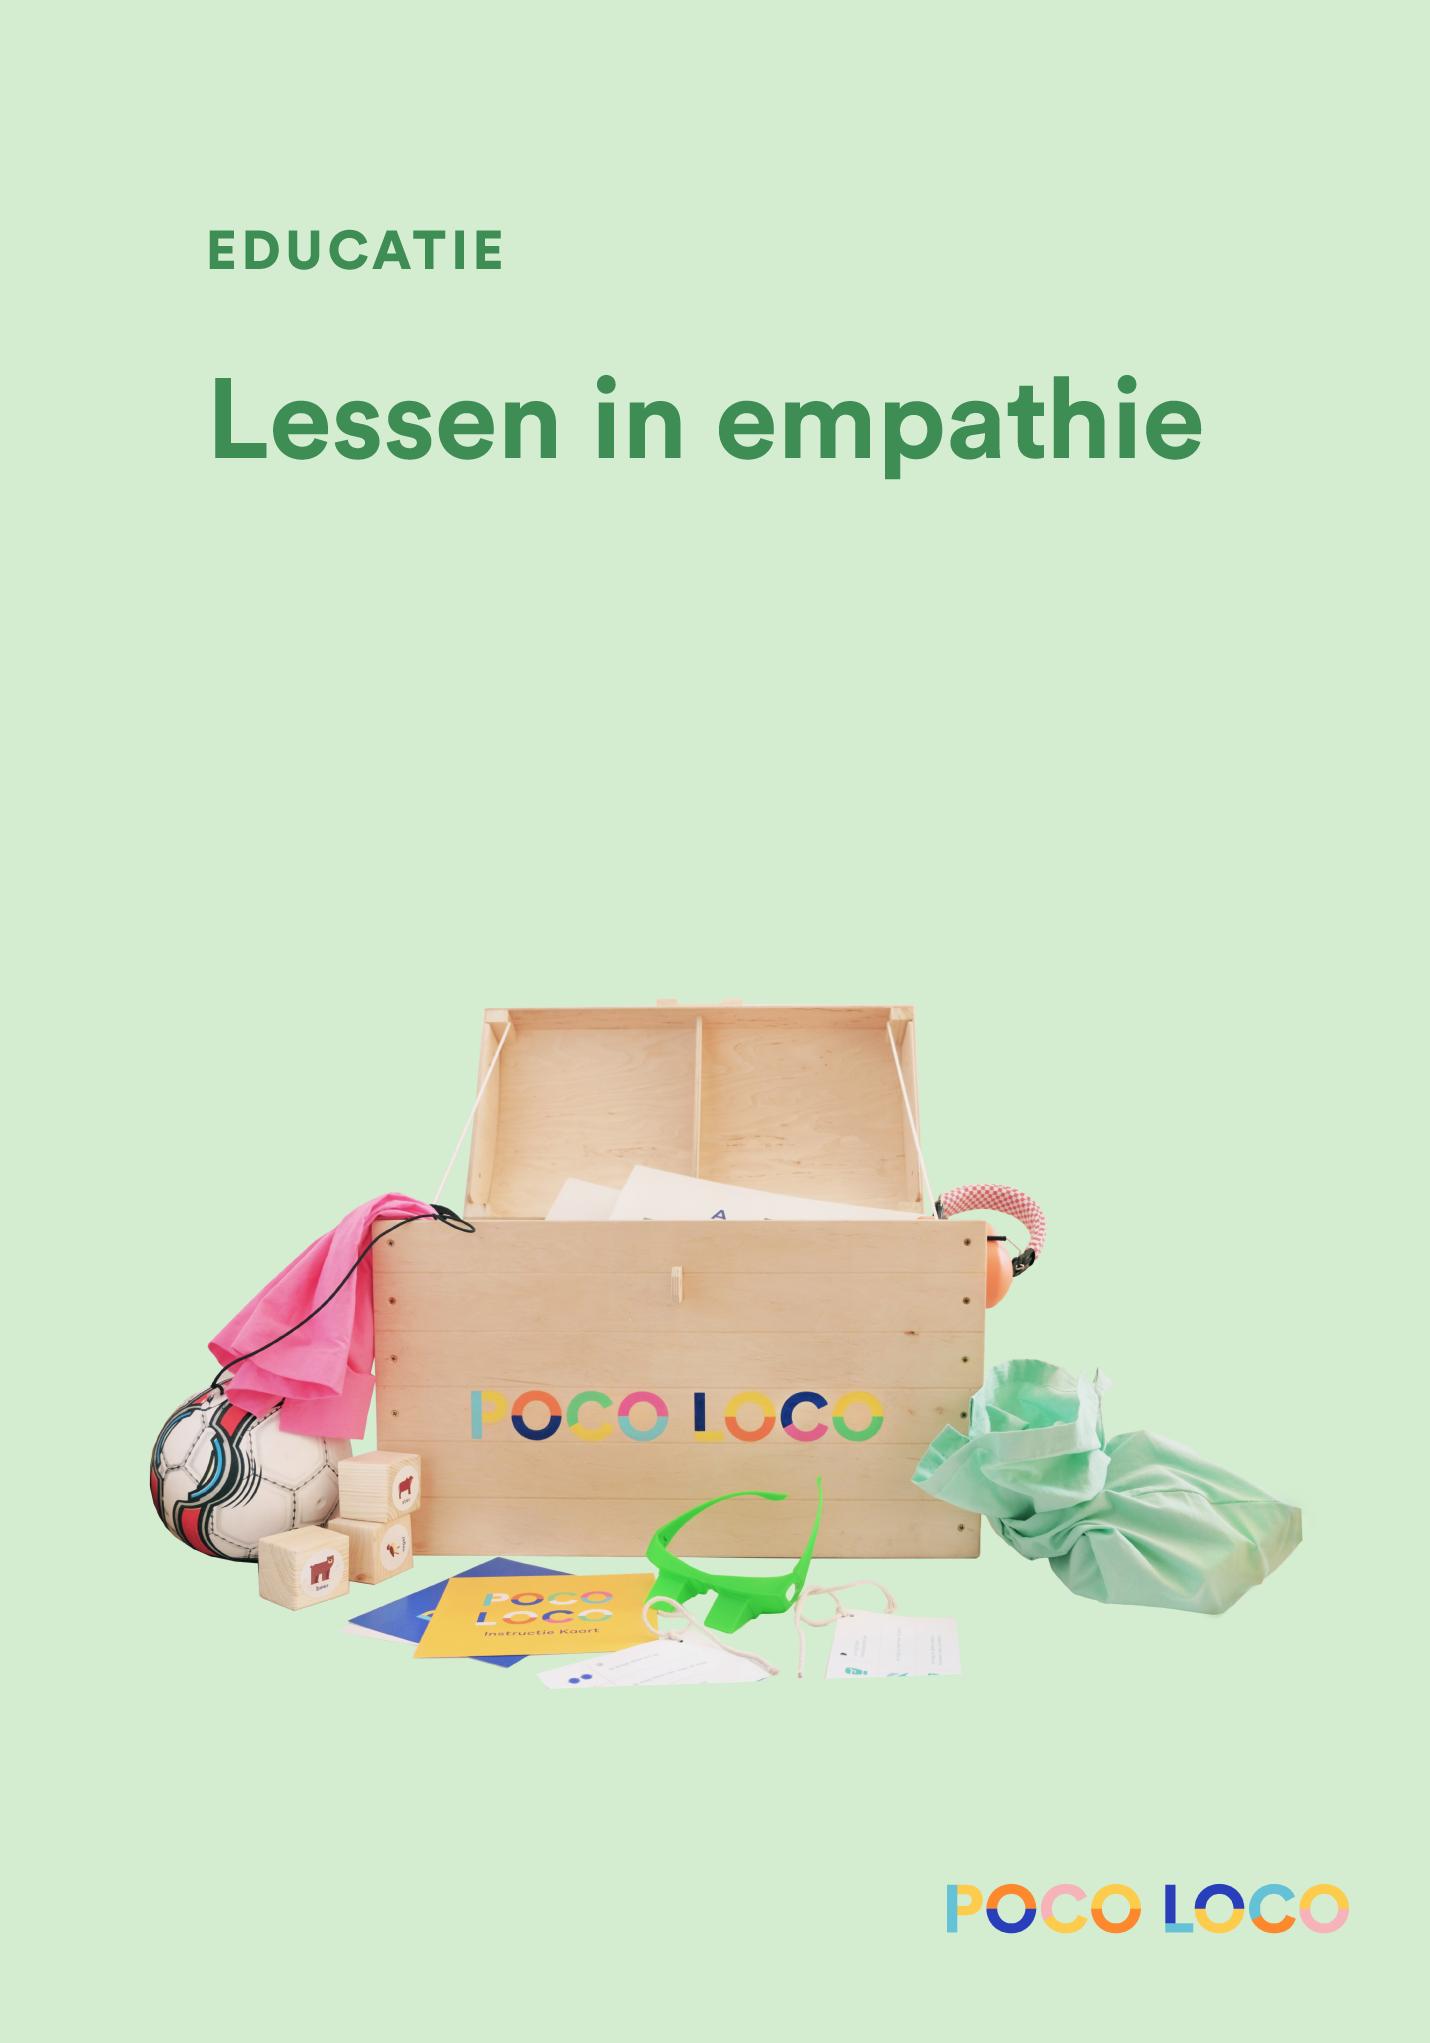 Project - Poco Loco - Lessen in empathie